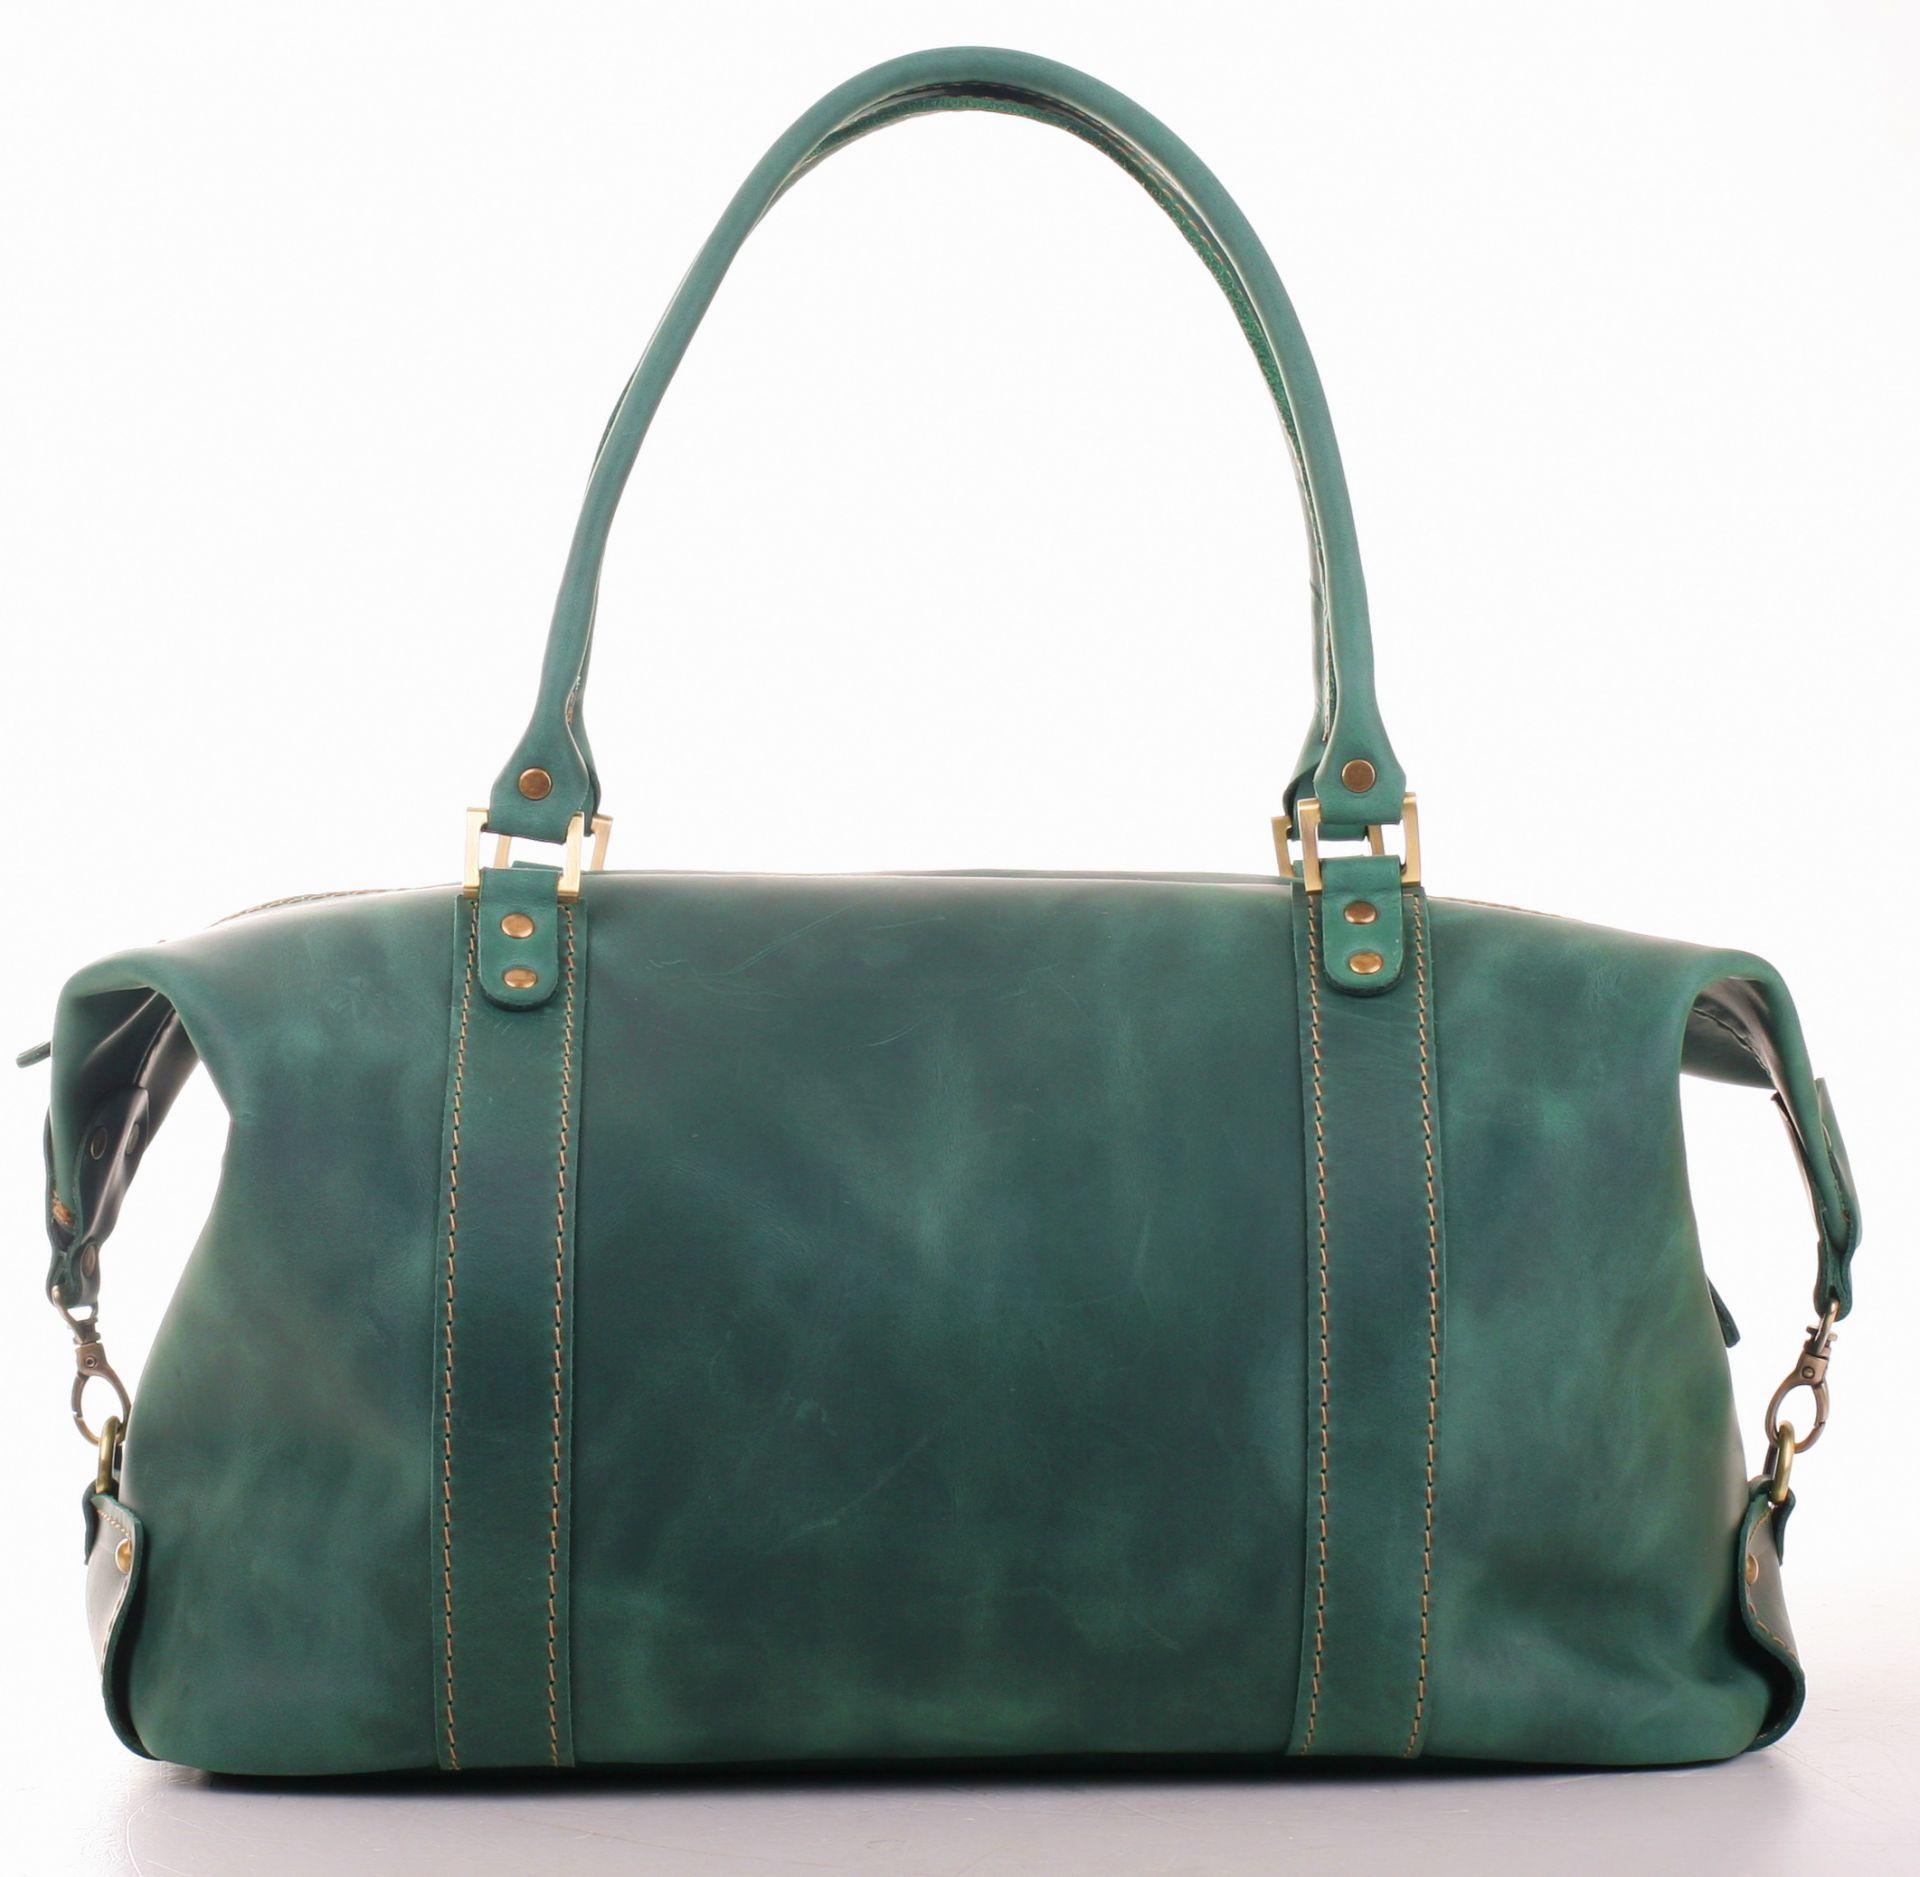 1ec2f4f71bf5 Кожаная сумка дорожно-спортивная в винтаж стиле - Travel Leather Bag  (414-8811)